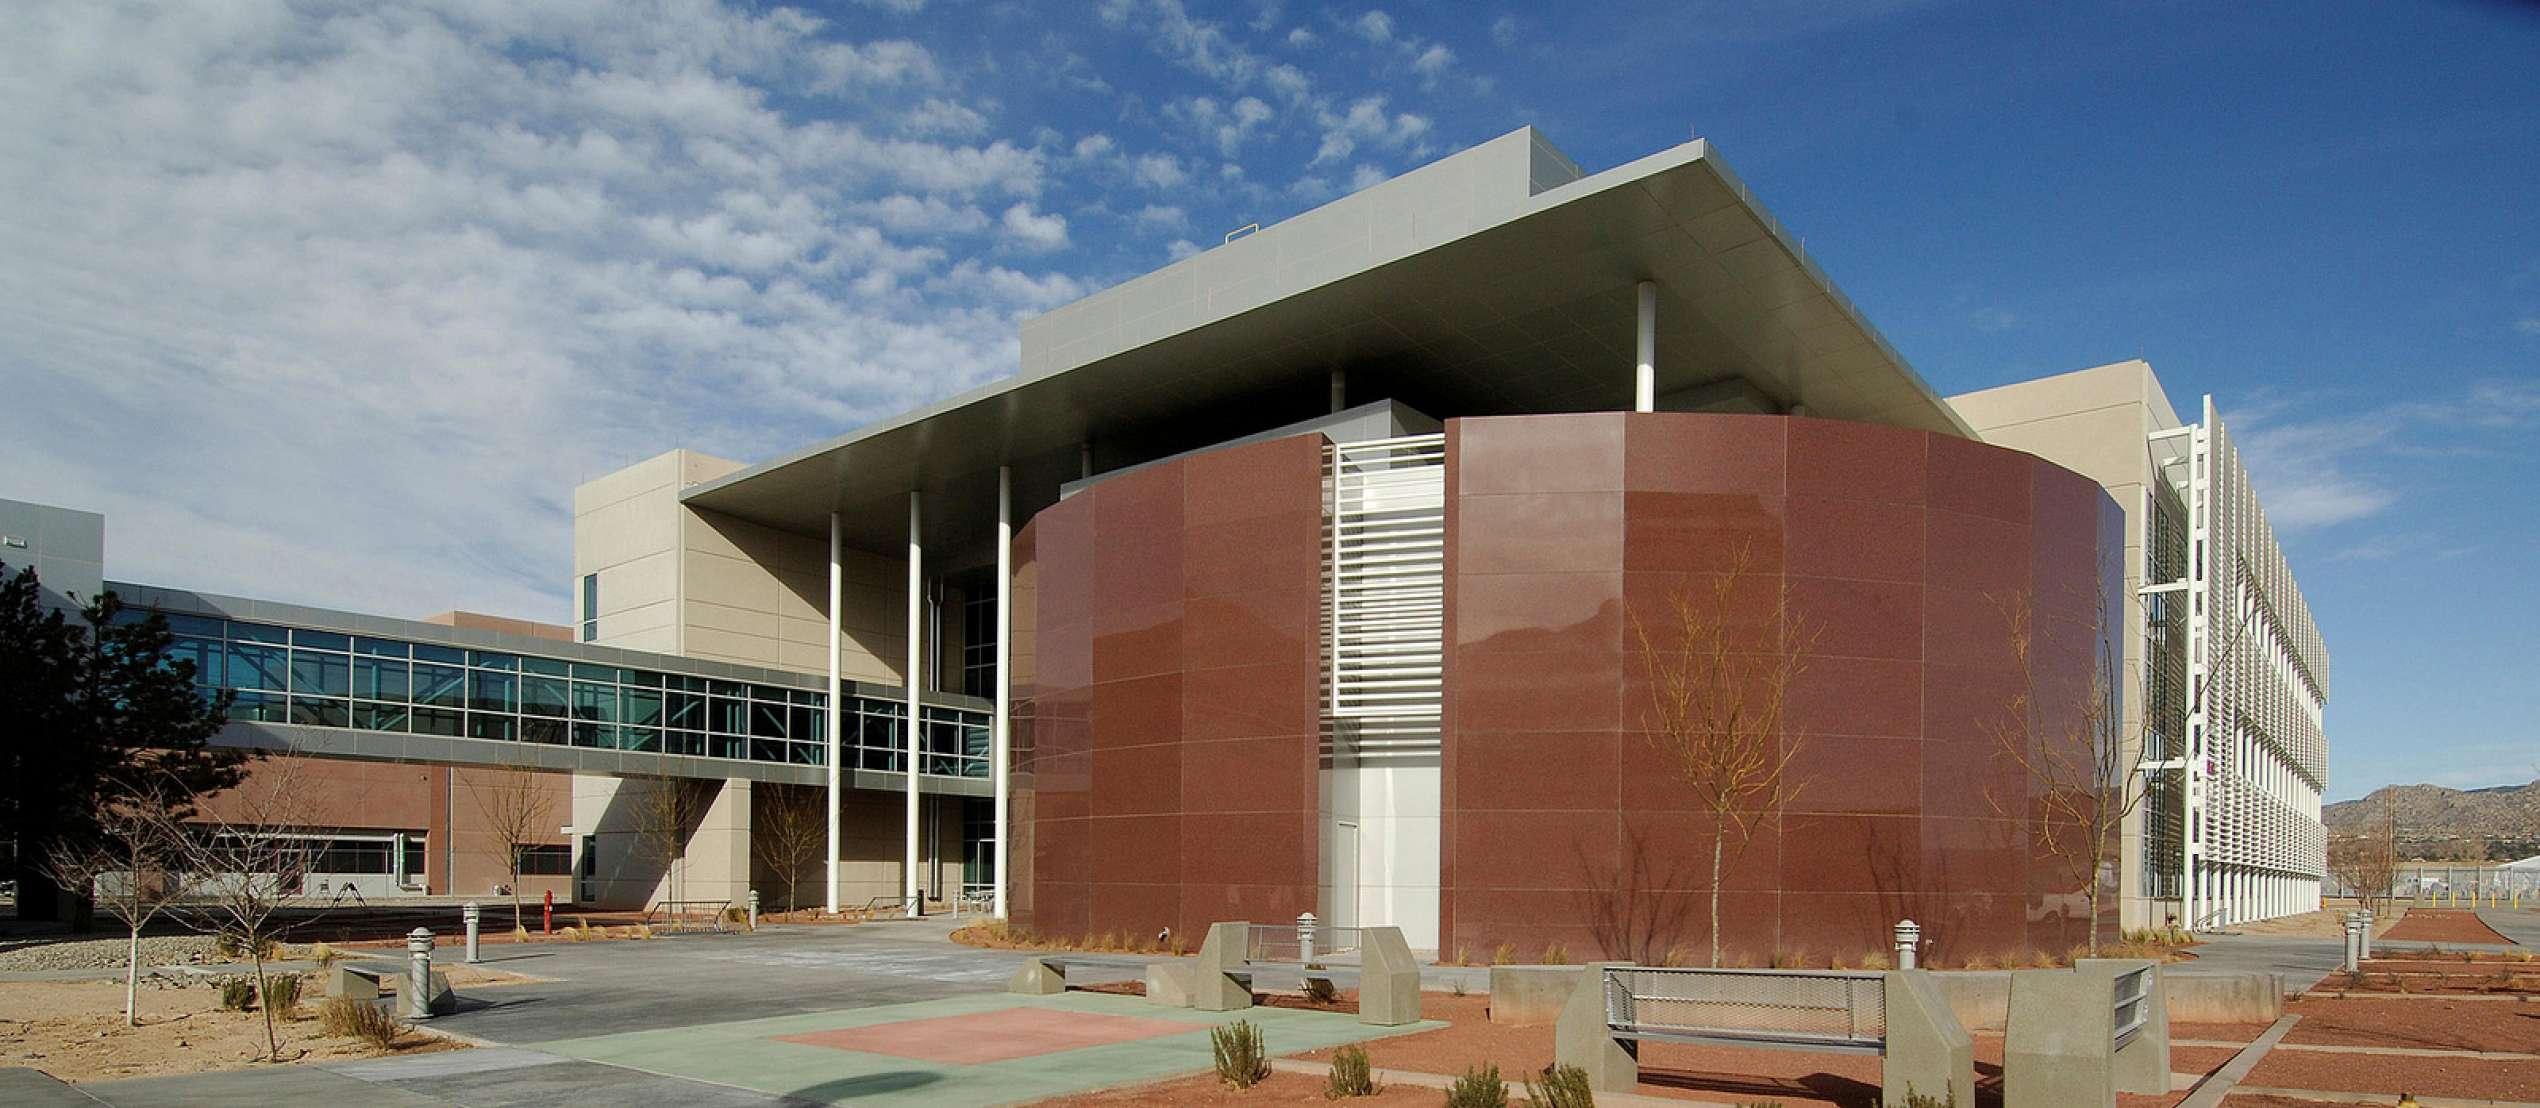 The Sandia National Laboratory campus.